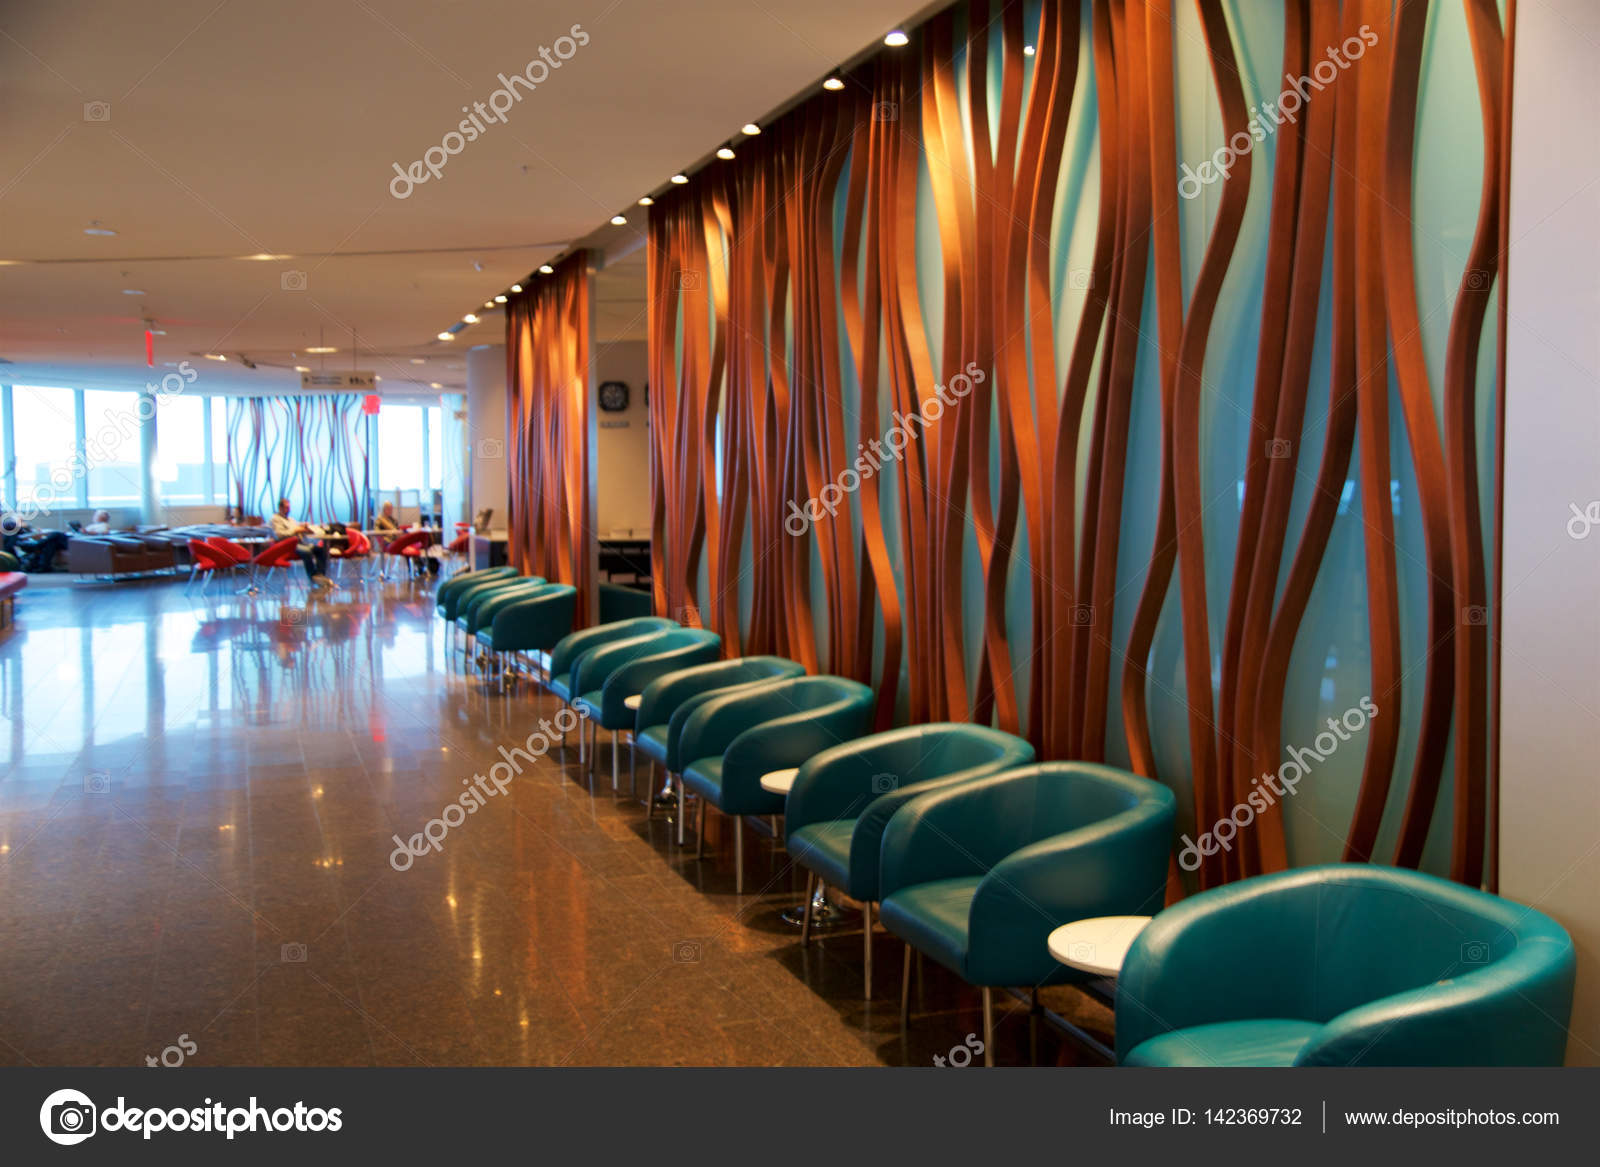 toronto canada jan 21st 2017 airport interior air canada maple